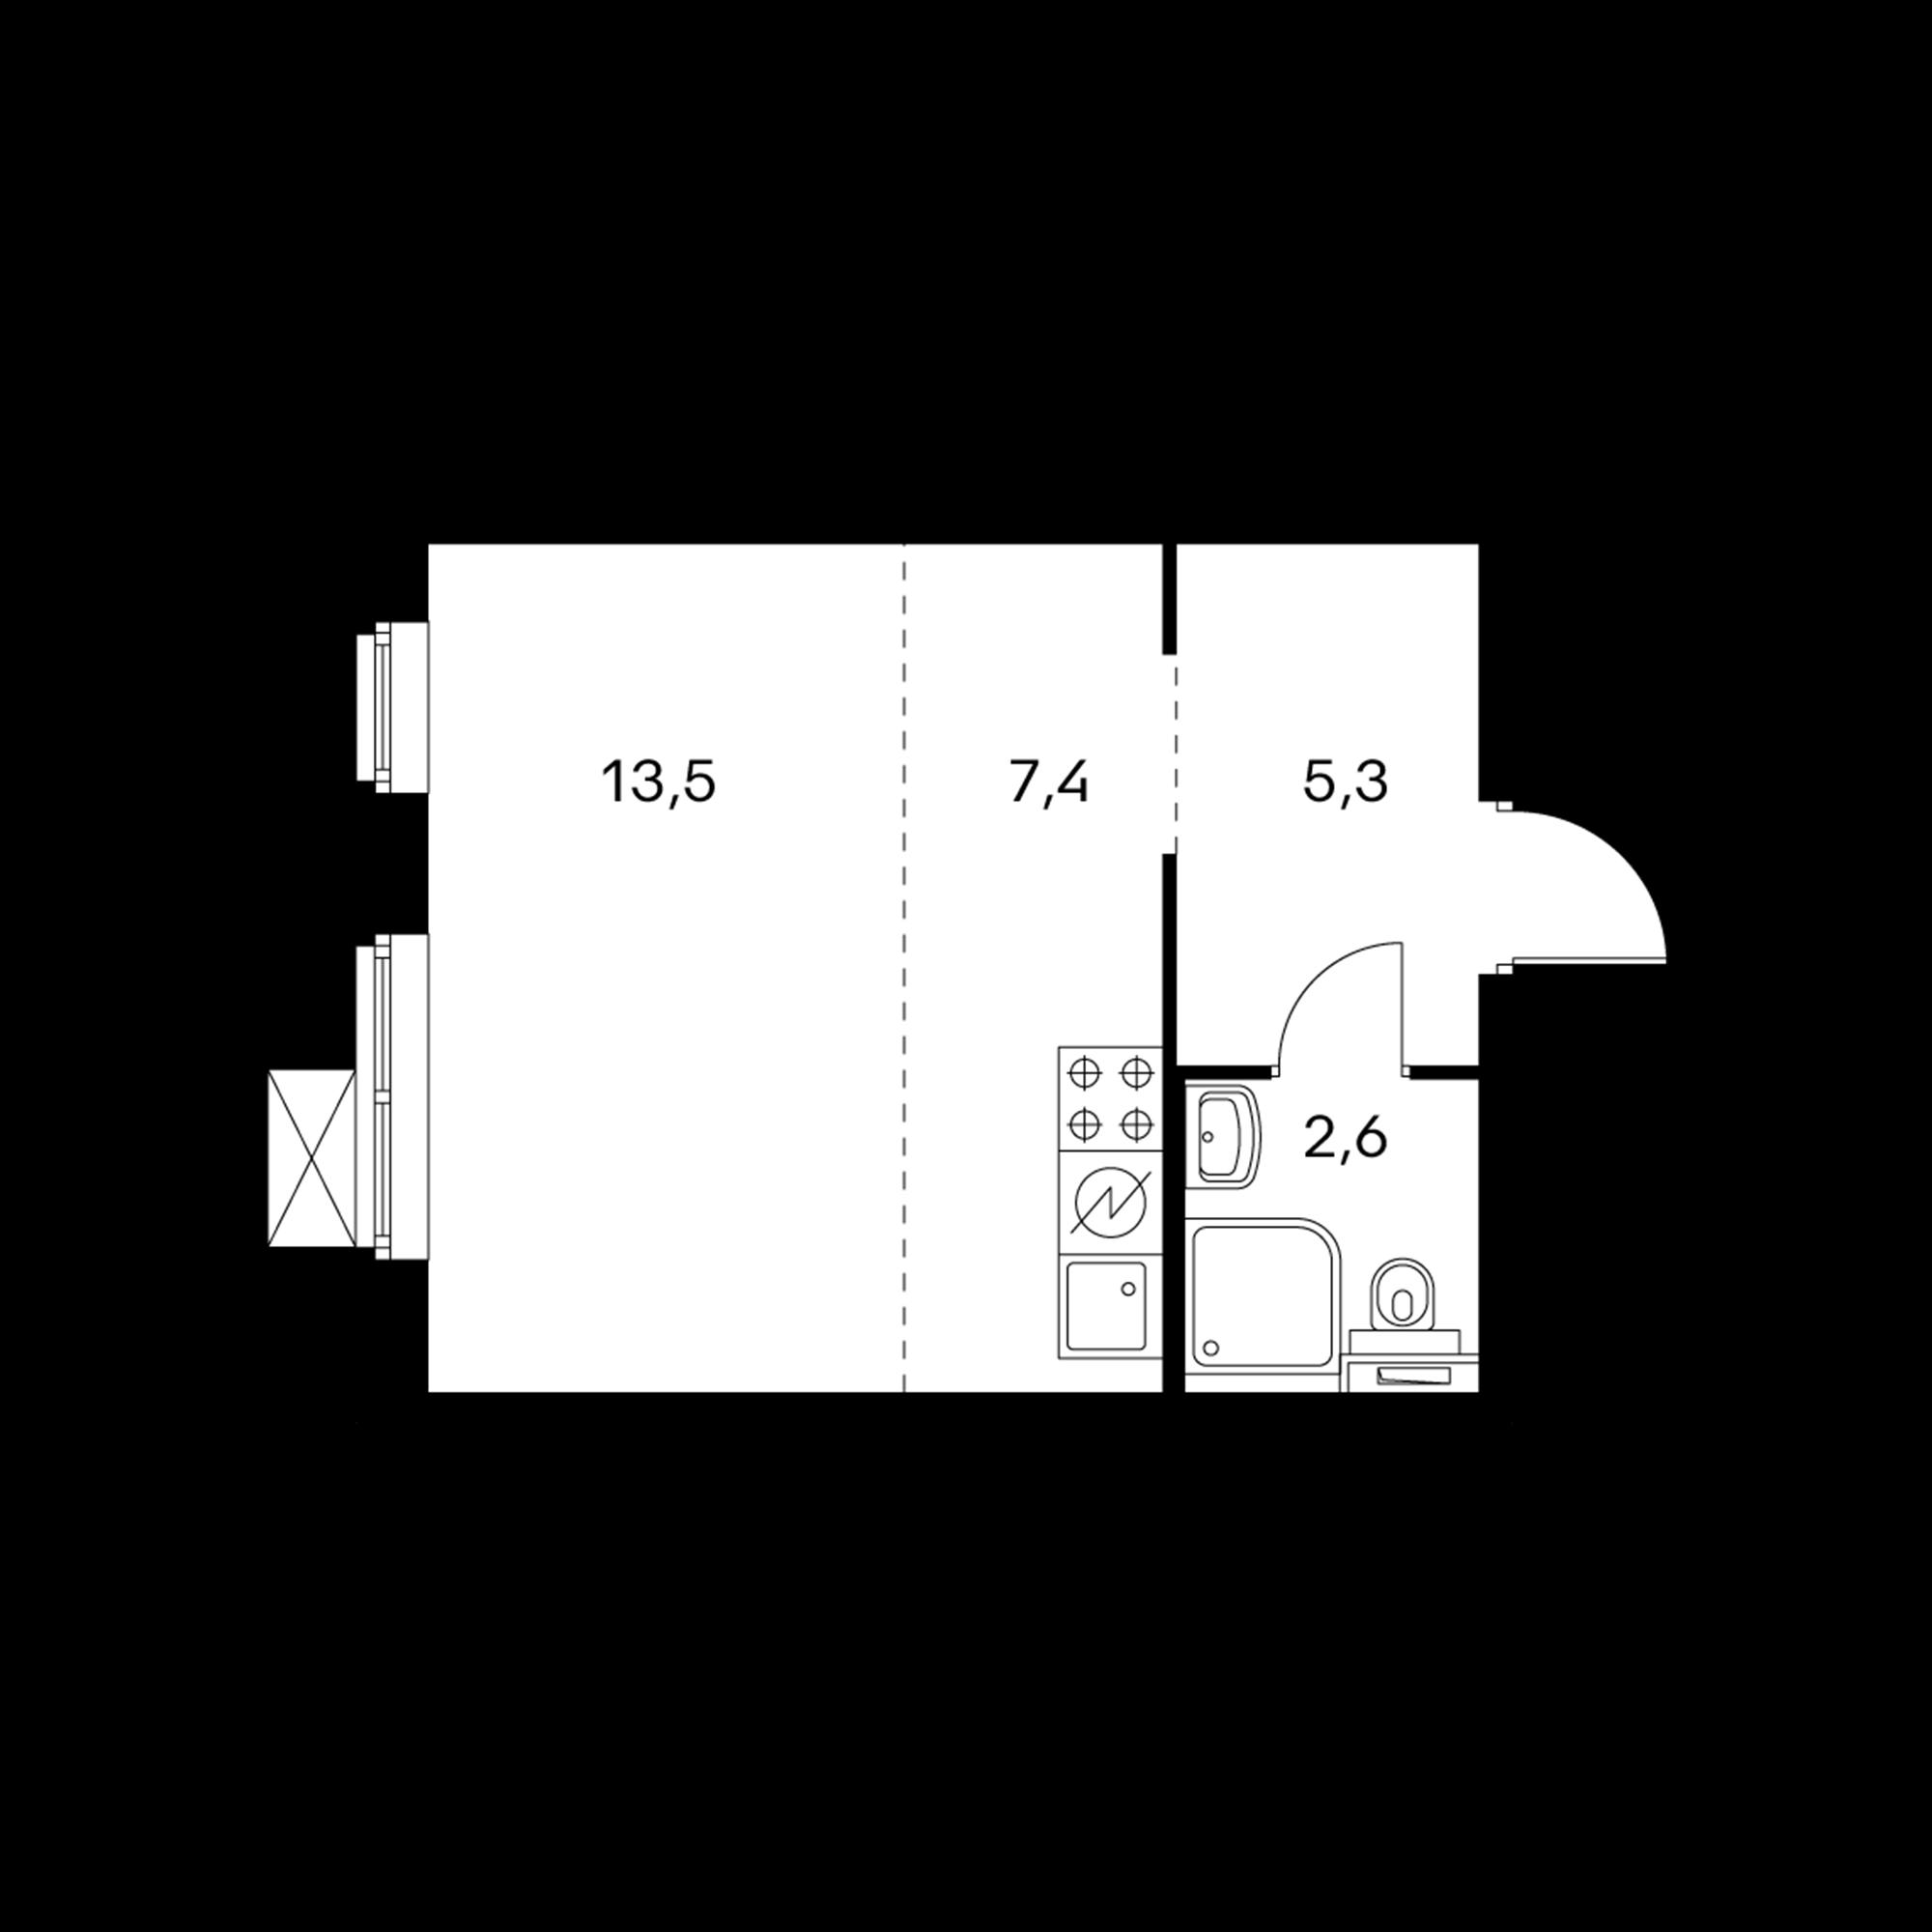 1NL1_5.1*-1